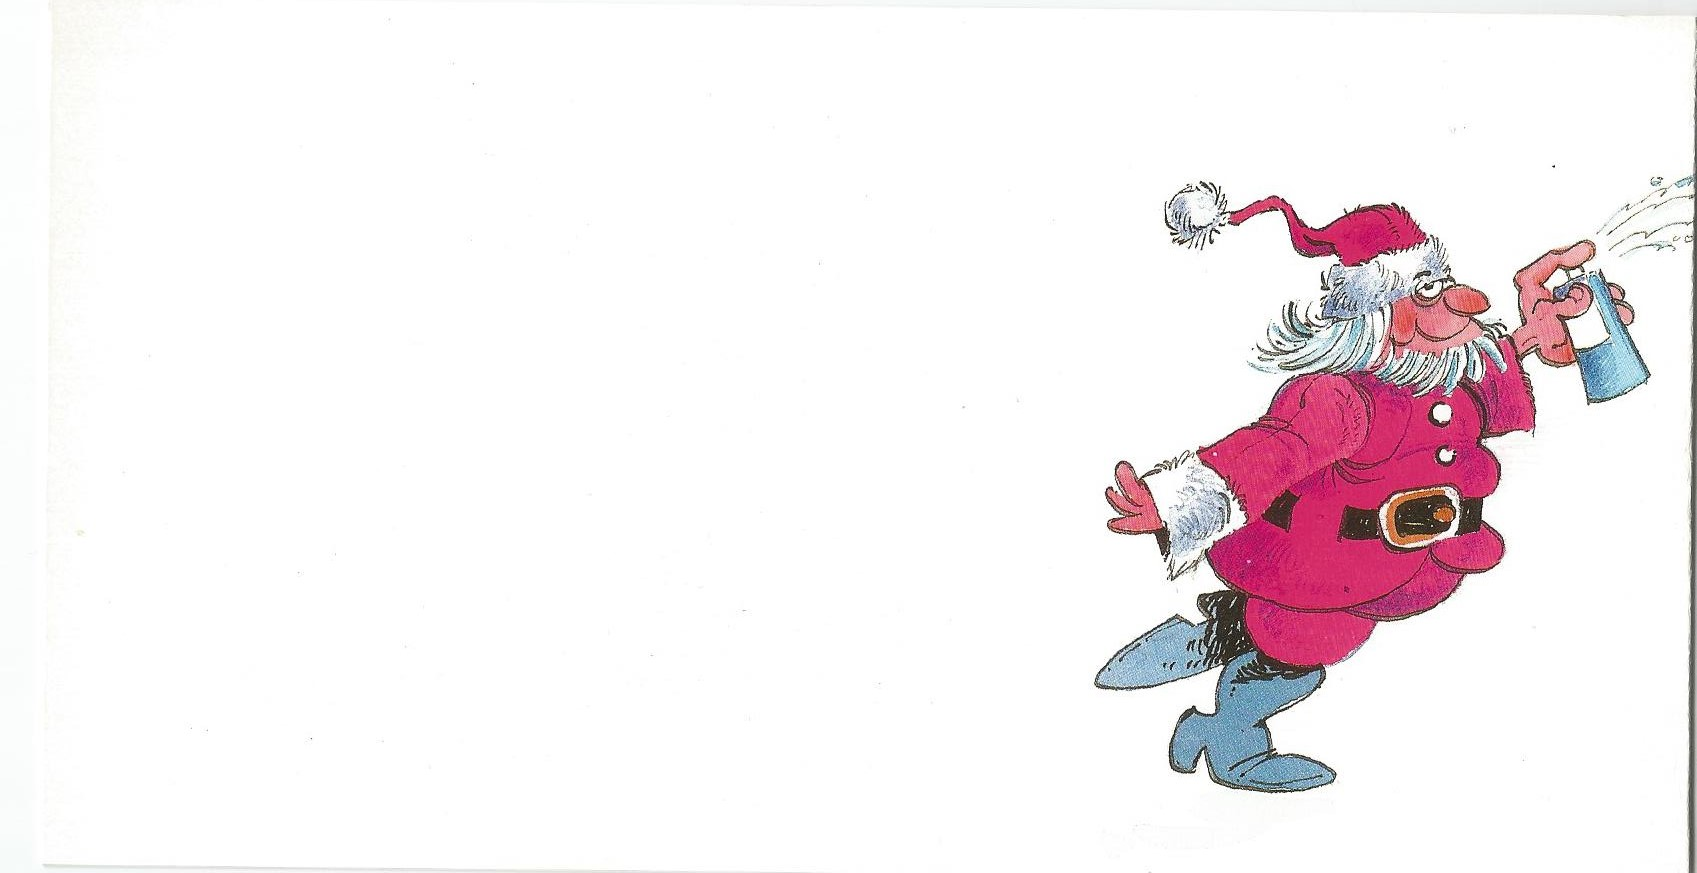 CHRISTMAS RFEP 1991 ANVERSO 2